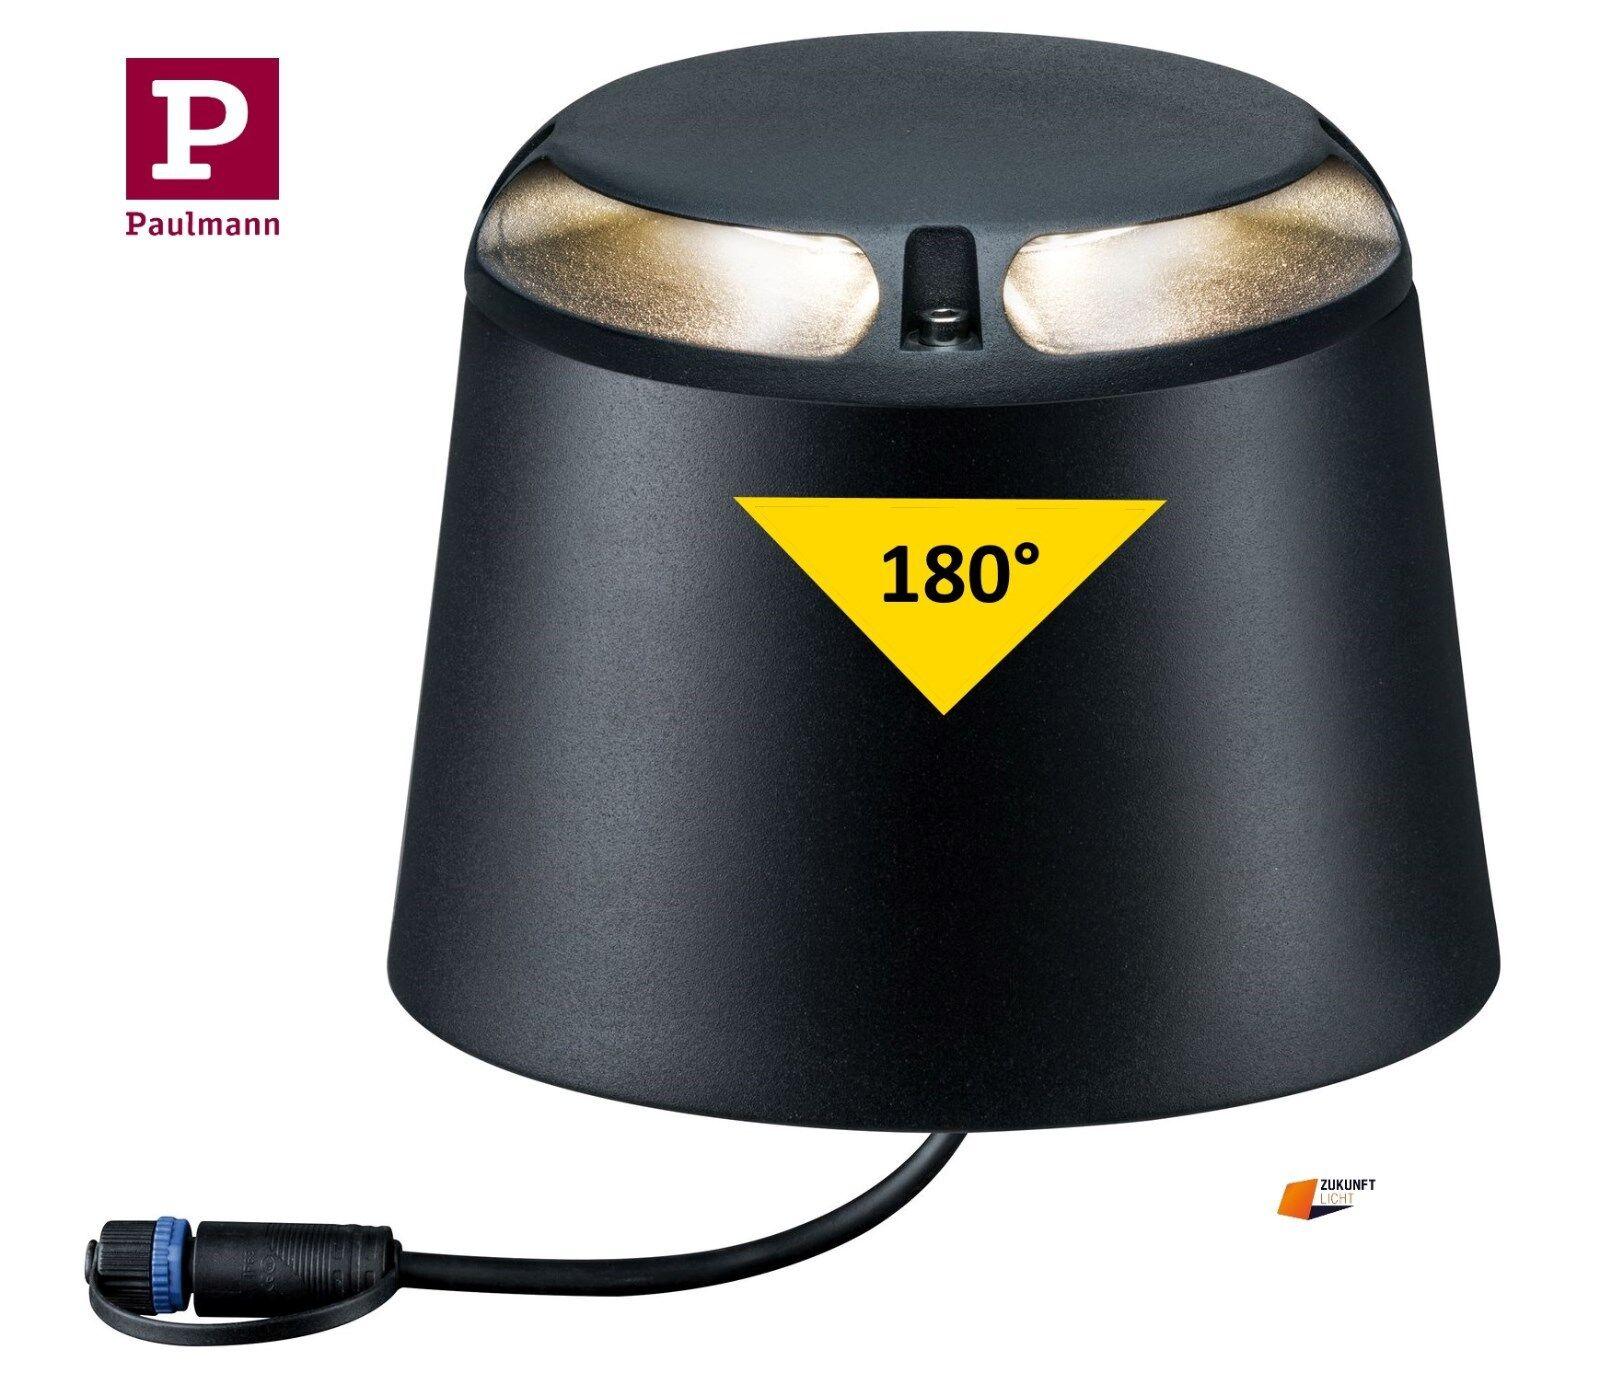 Paulmann Plug&Shine Plug&Shine Plug&Shine Aussen 24V LED Lichtsystem für gehobene Ansprüche im Garten bd745c